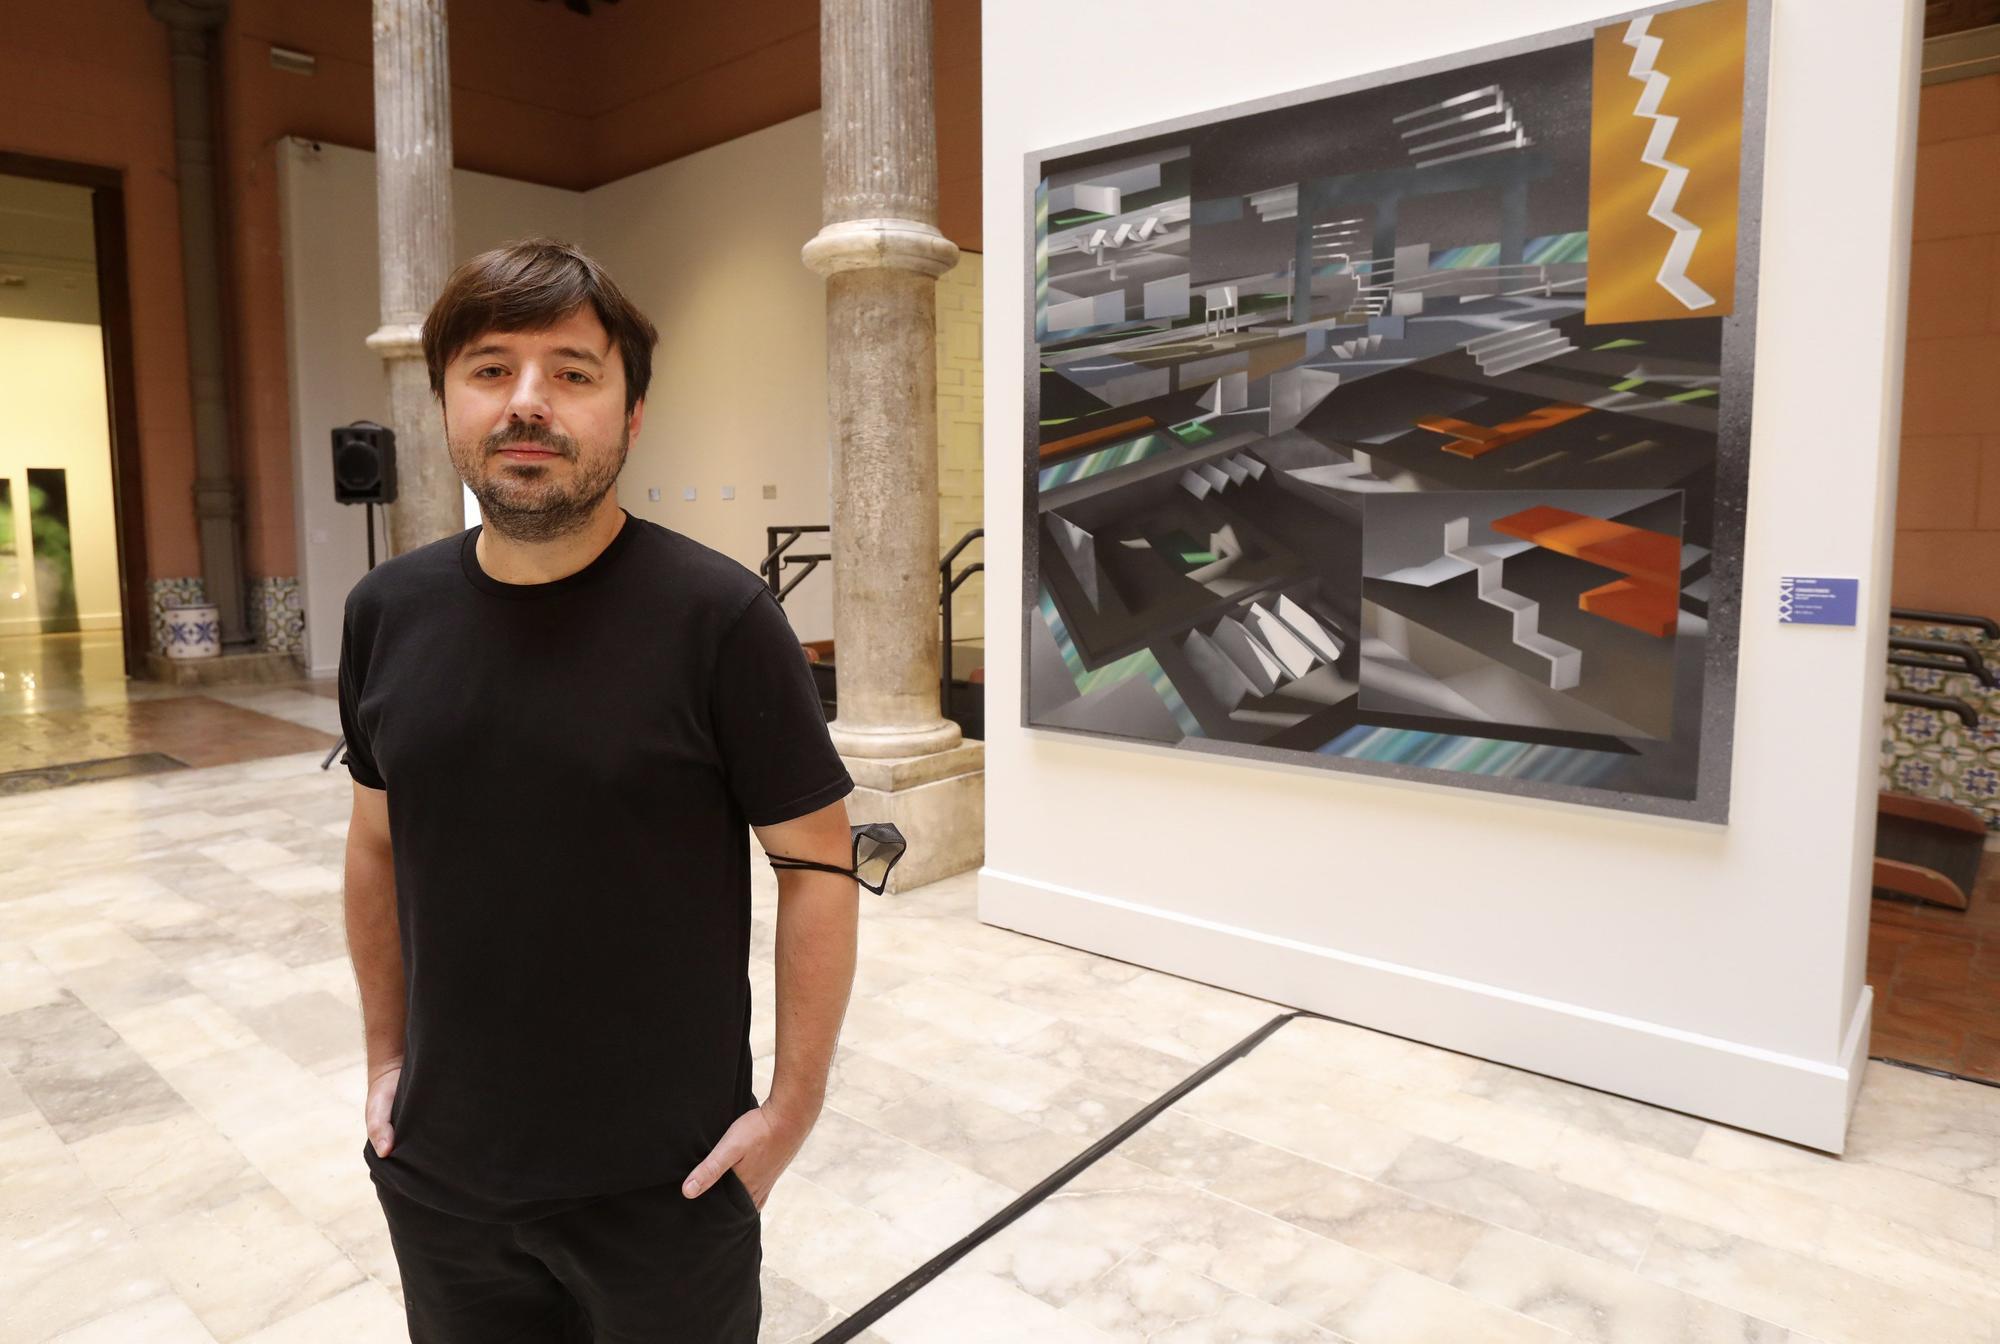 Fernando Romero con la obra ganadora, 'Colonia exoplaneta kepler 80 g. Año 2243'.